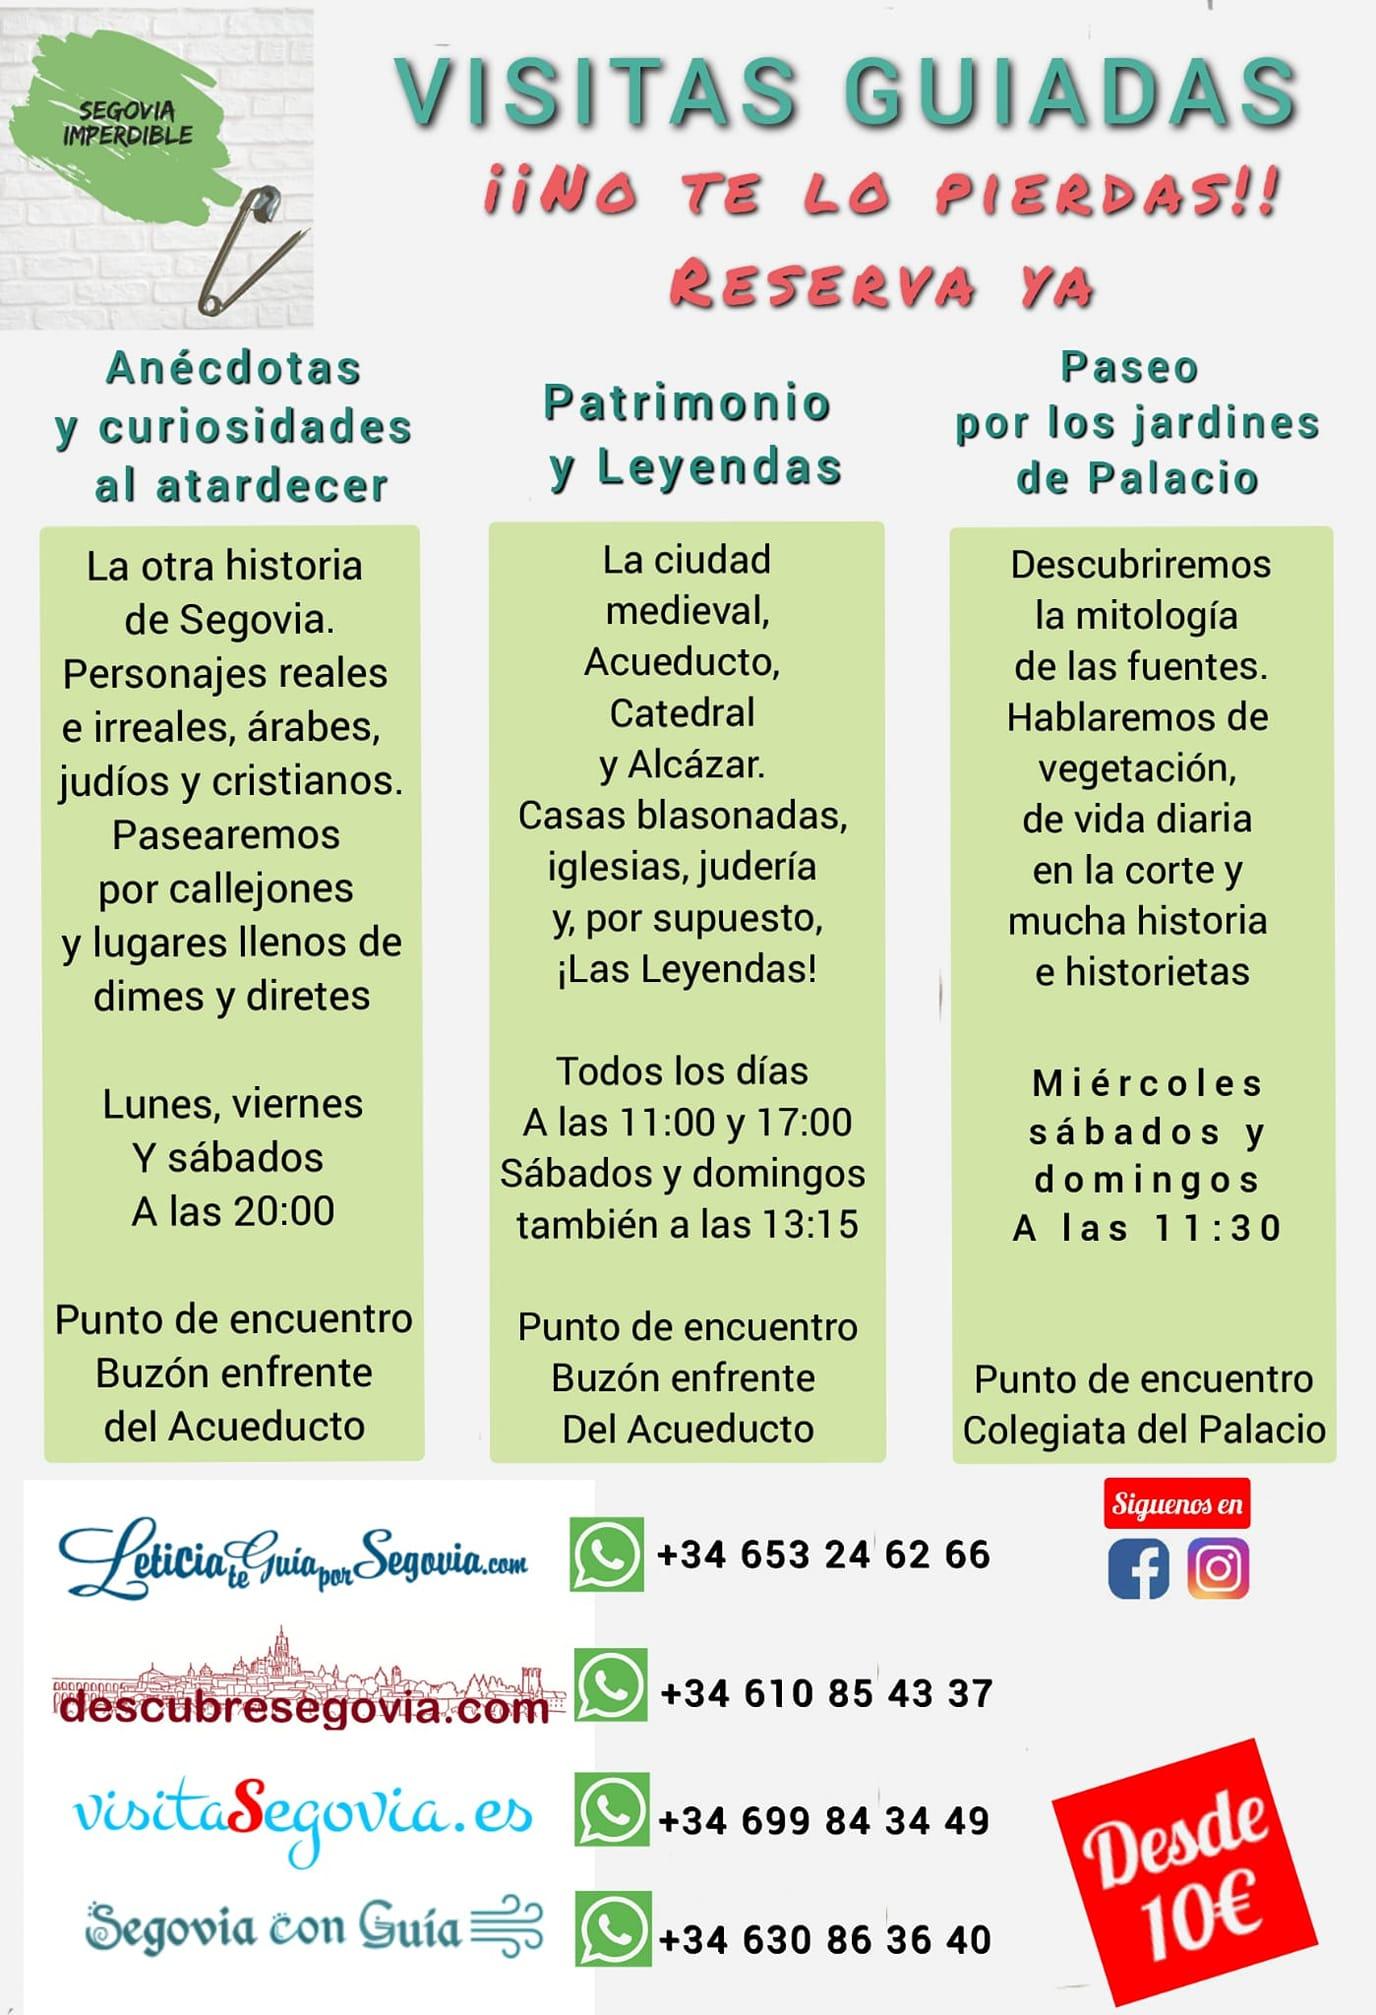 Visitas Segovia Imperdible verano 2020